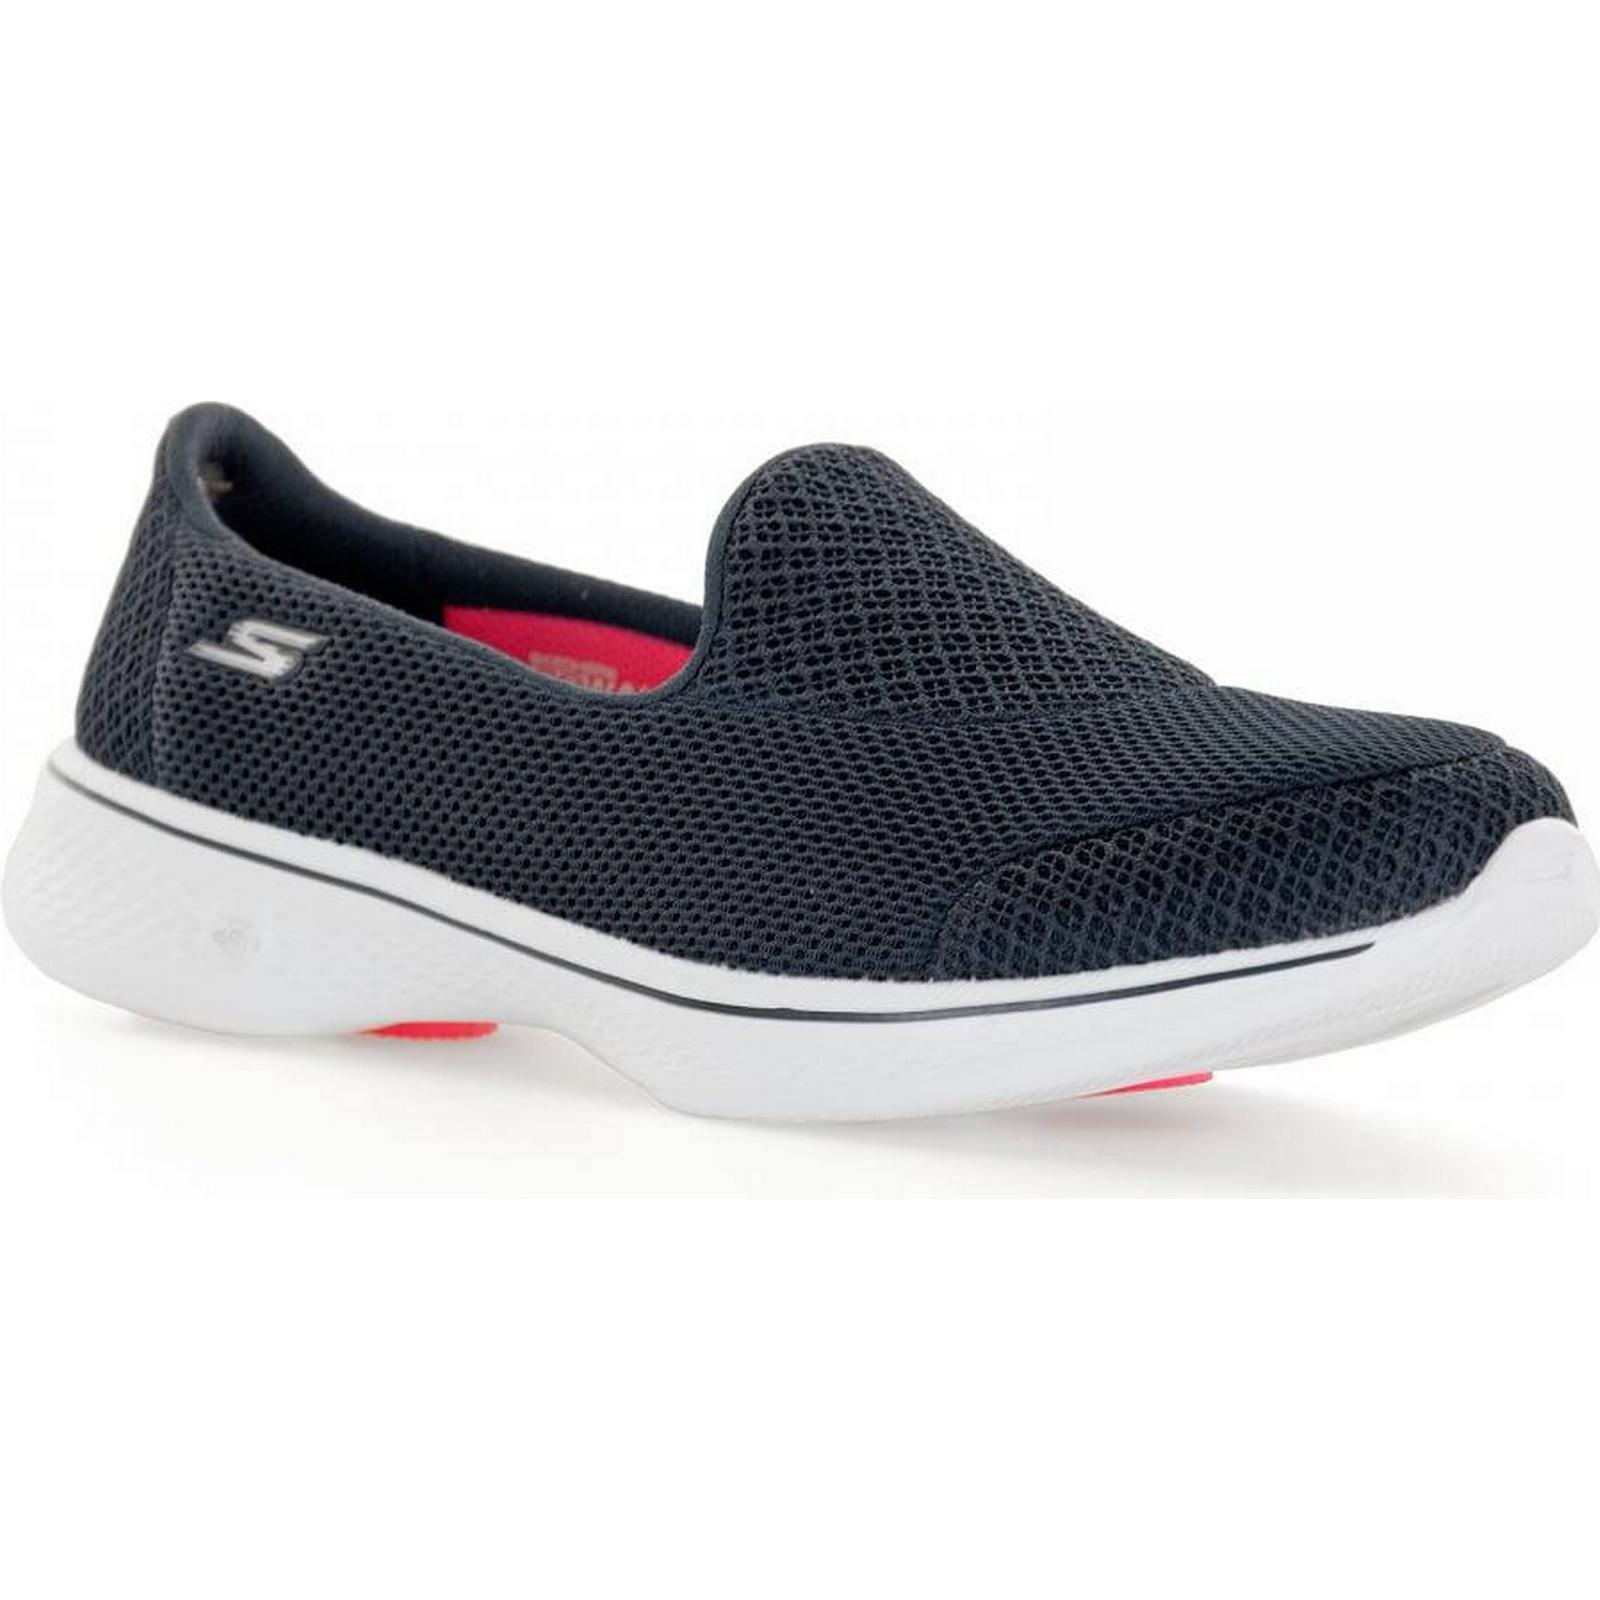 Skechers Womens Go 6, Walk 4 Trainers (Navy) Size: 6, Go Colour: NAVY 1228ac